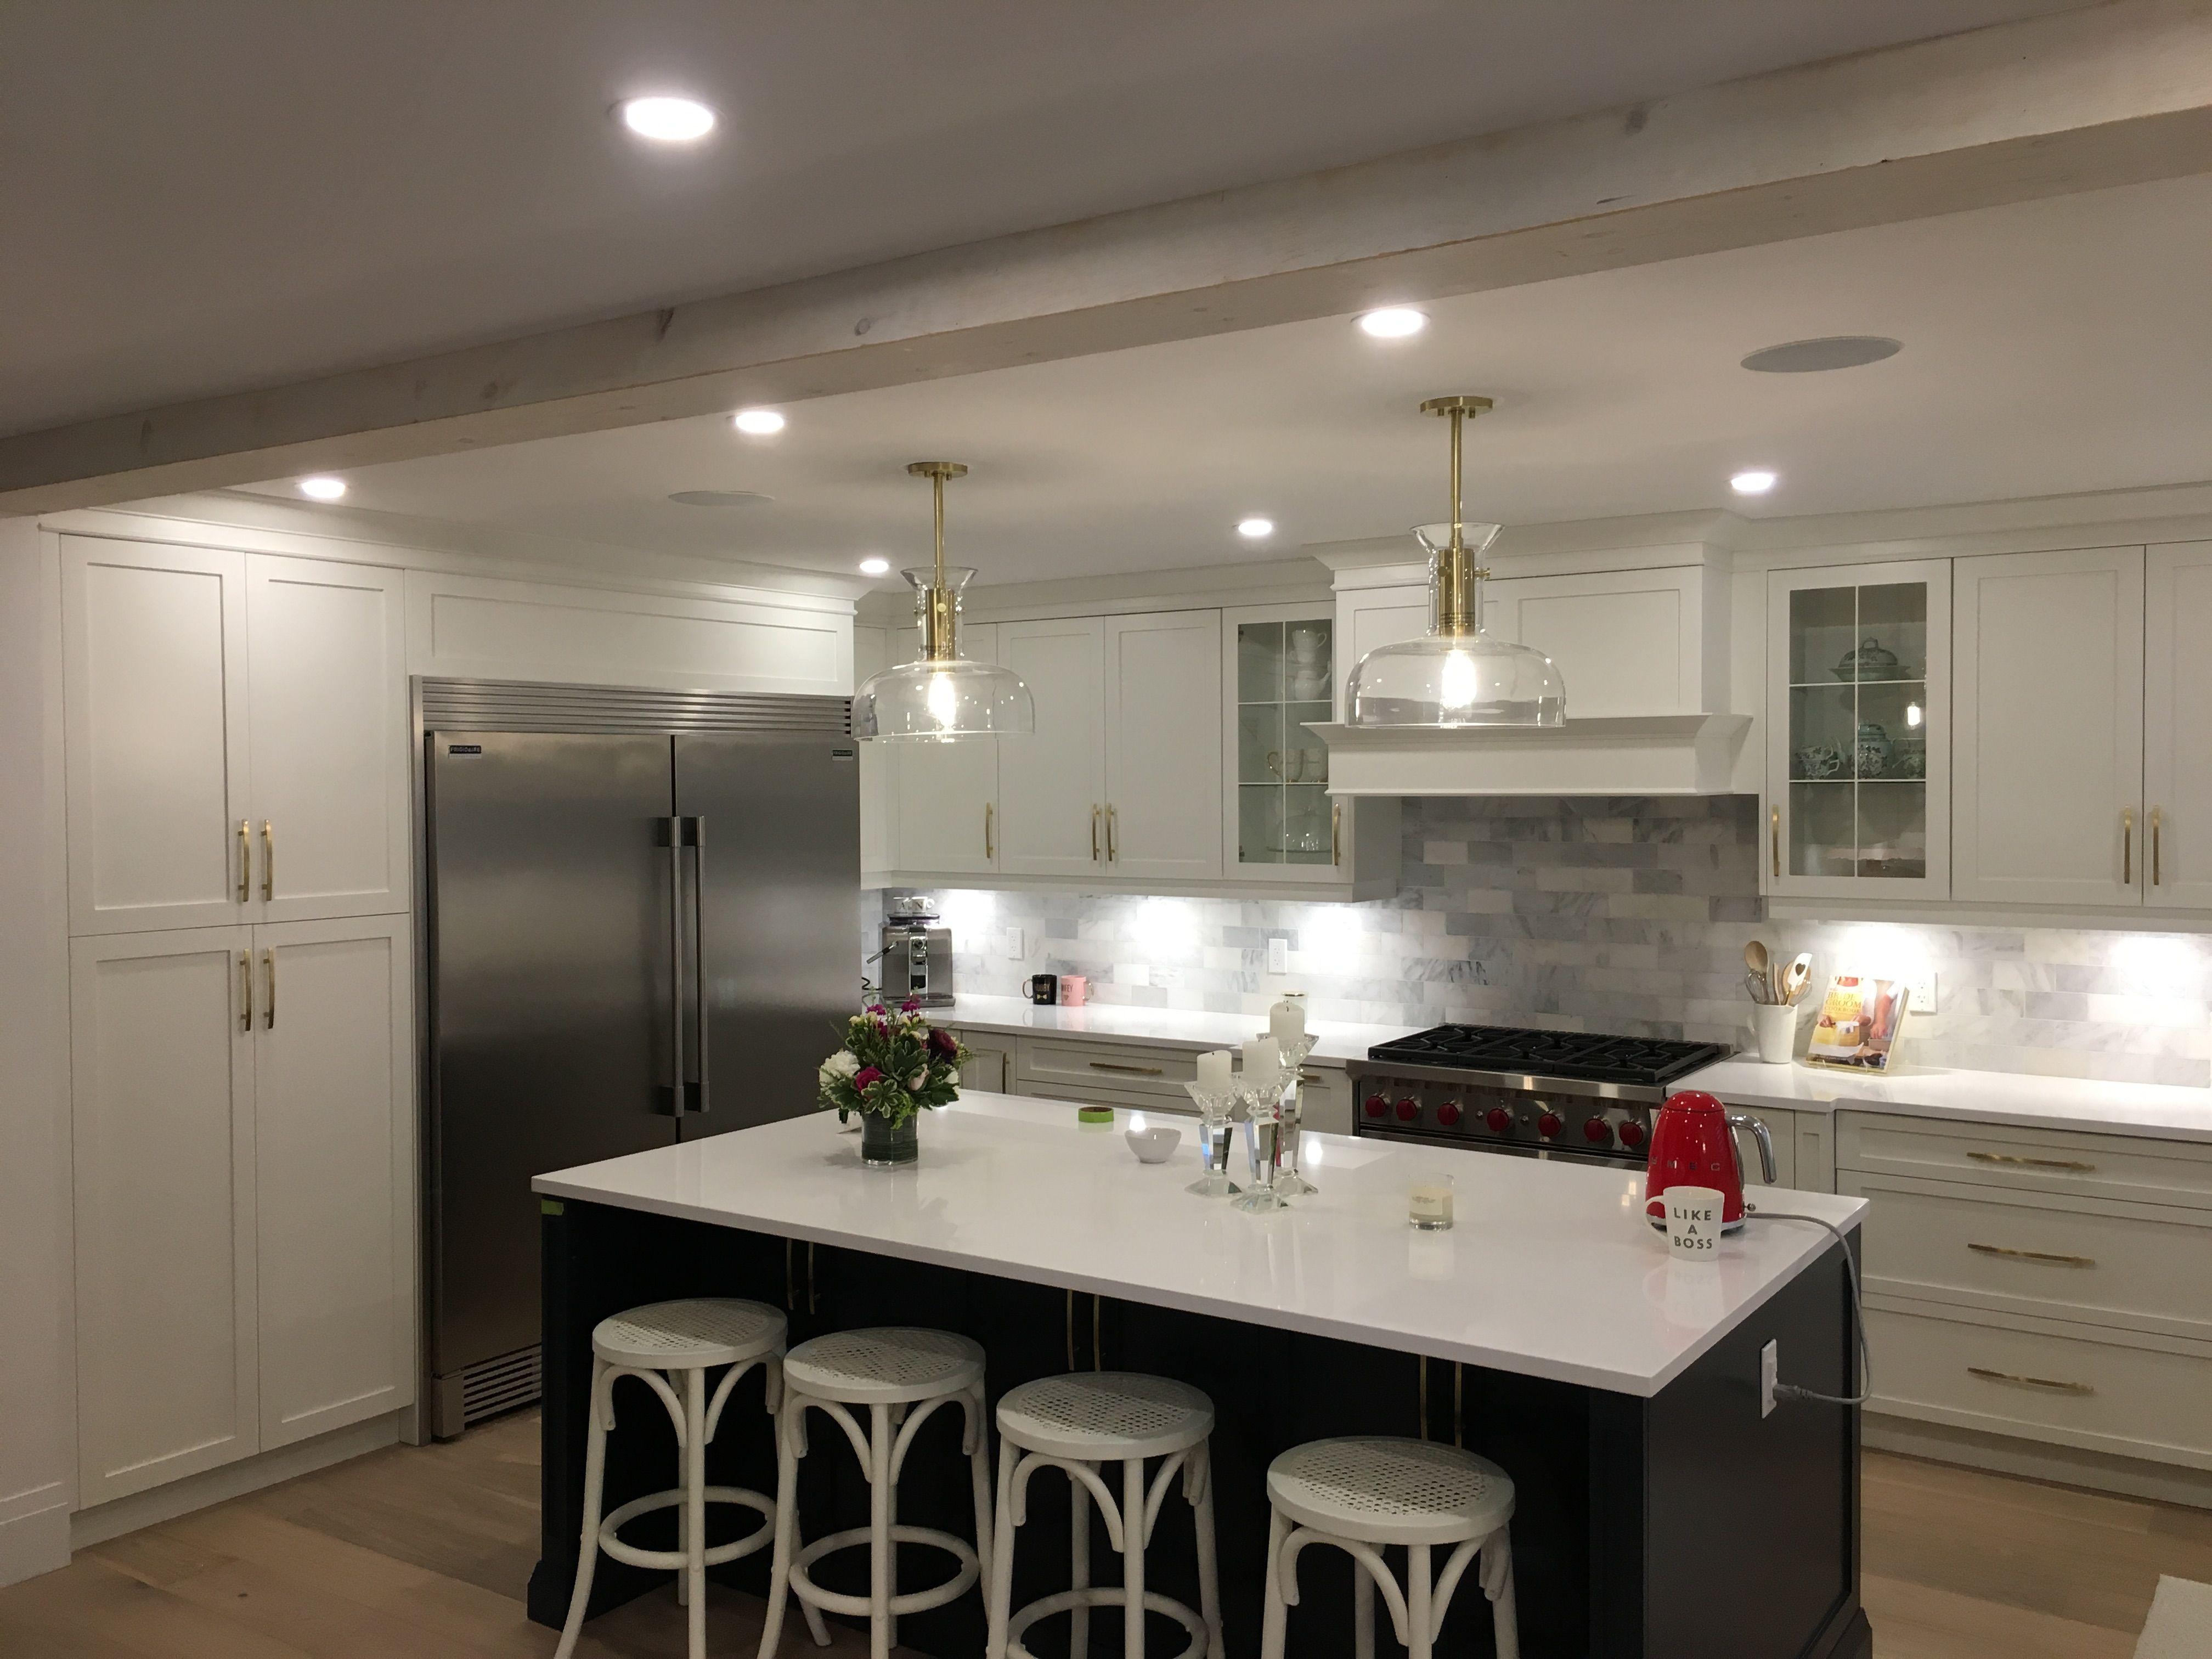 Advance Kitchen Cabinets Brampton - Chaima Kitchen Ideas